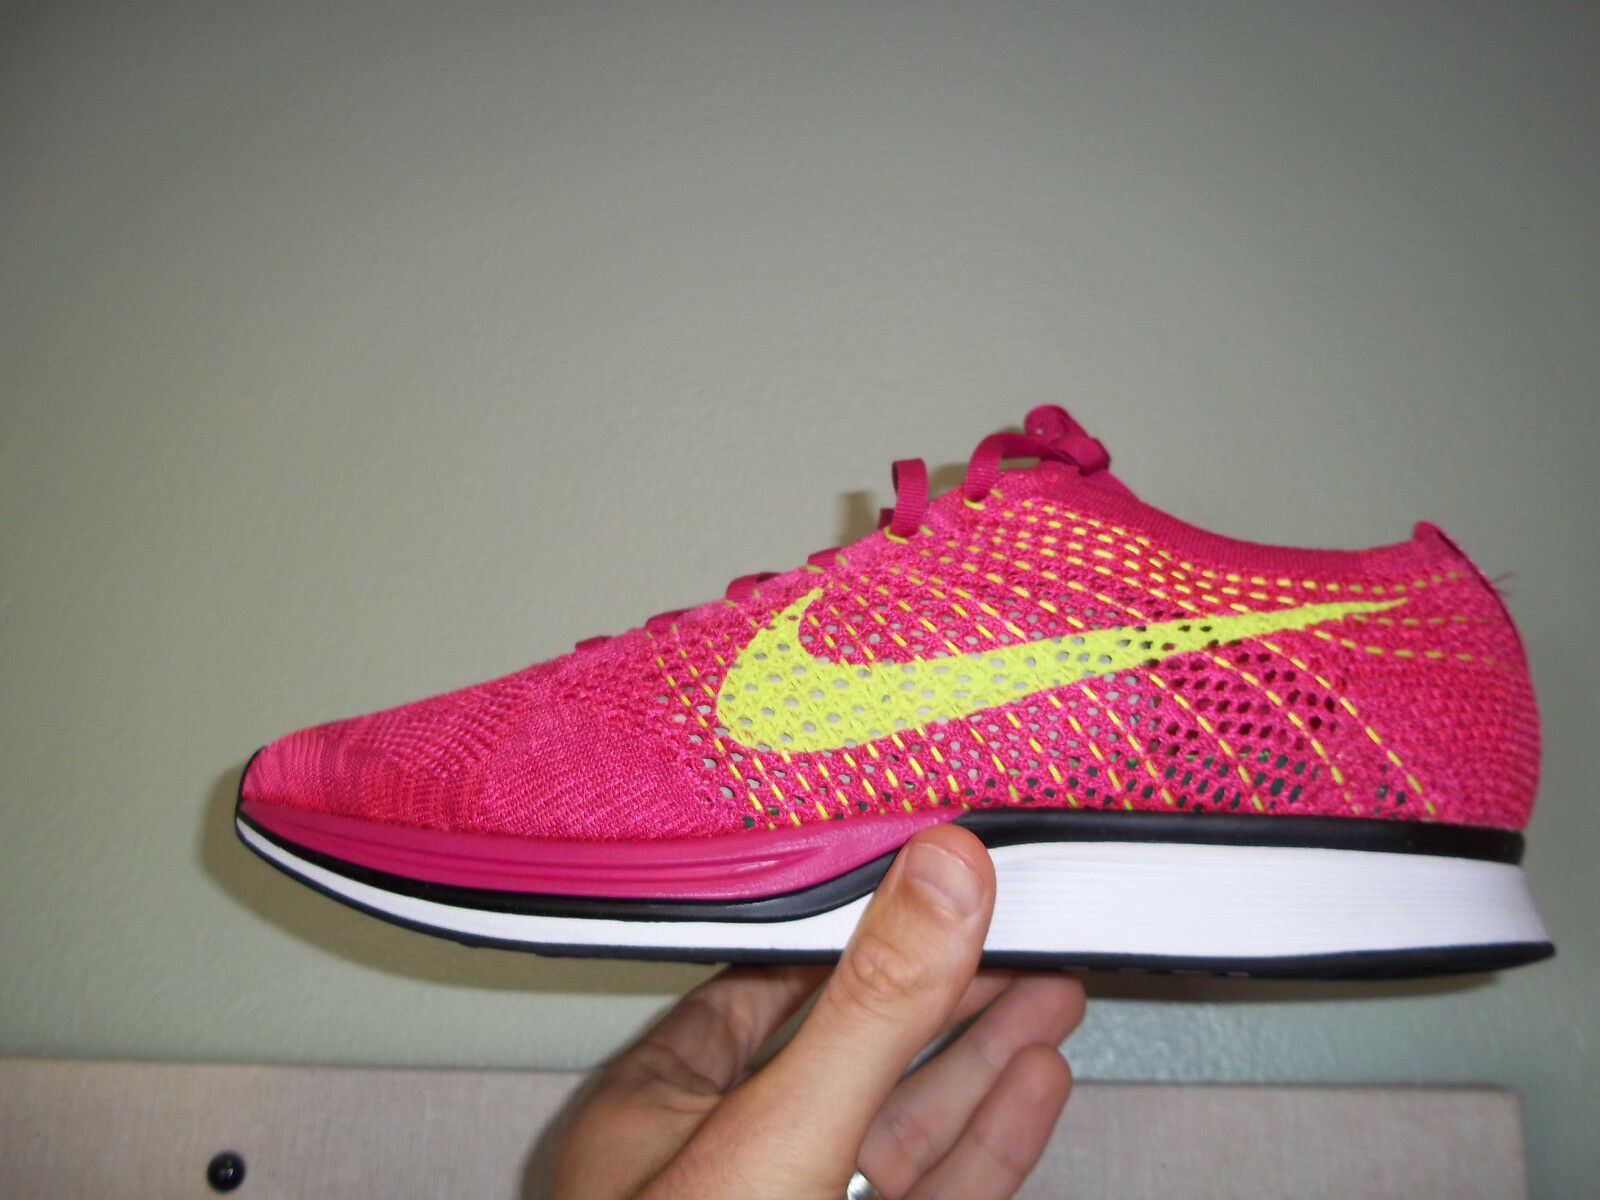 Men's Nike Flyknit Racer size 14 (526628 607) Fireberry/Volt No Box Top